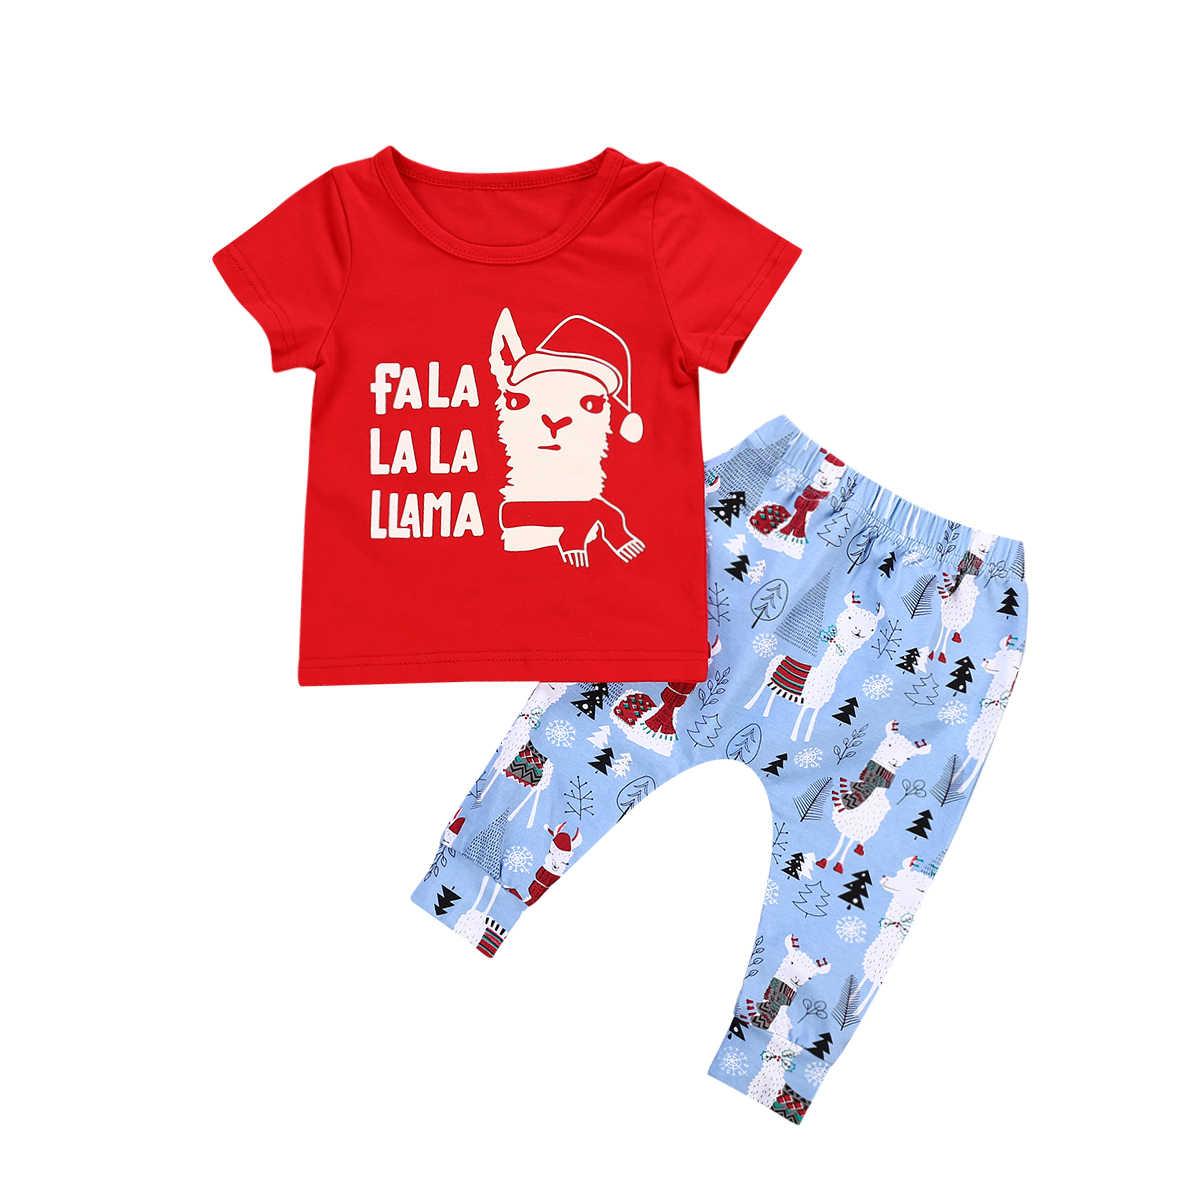 ae79e63cf Baby Boy Wear Images | Kuenzi Turf & Nursery